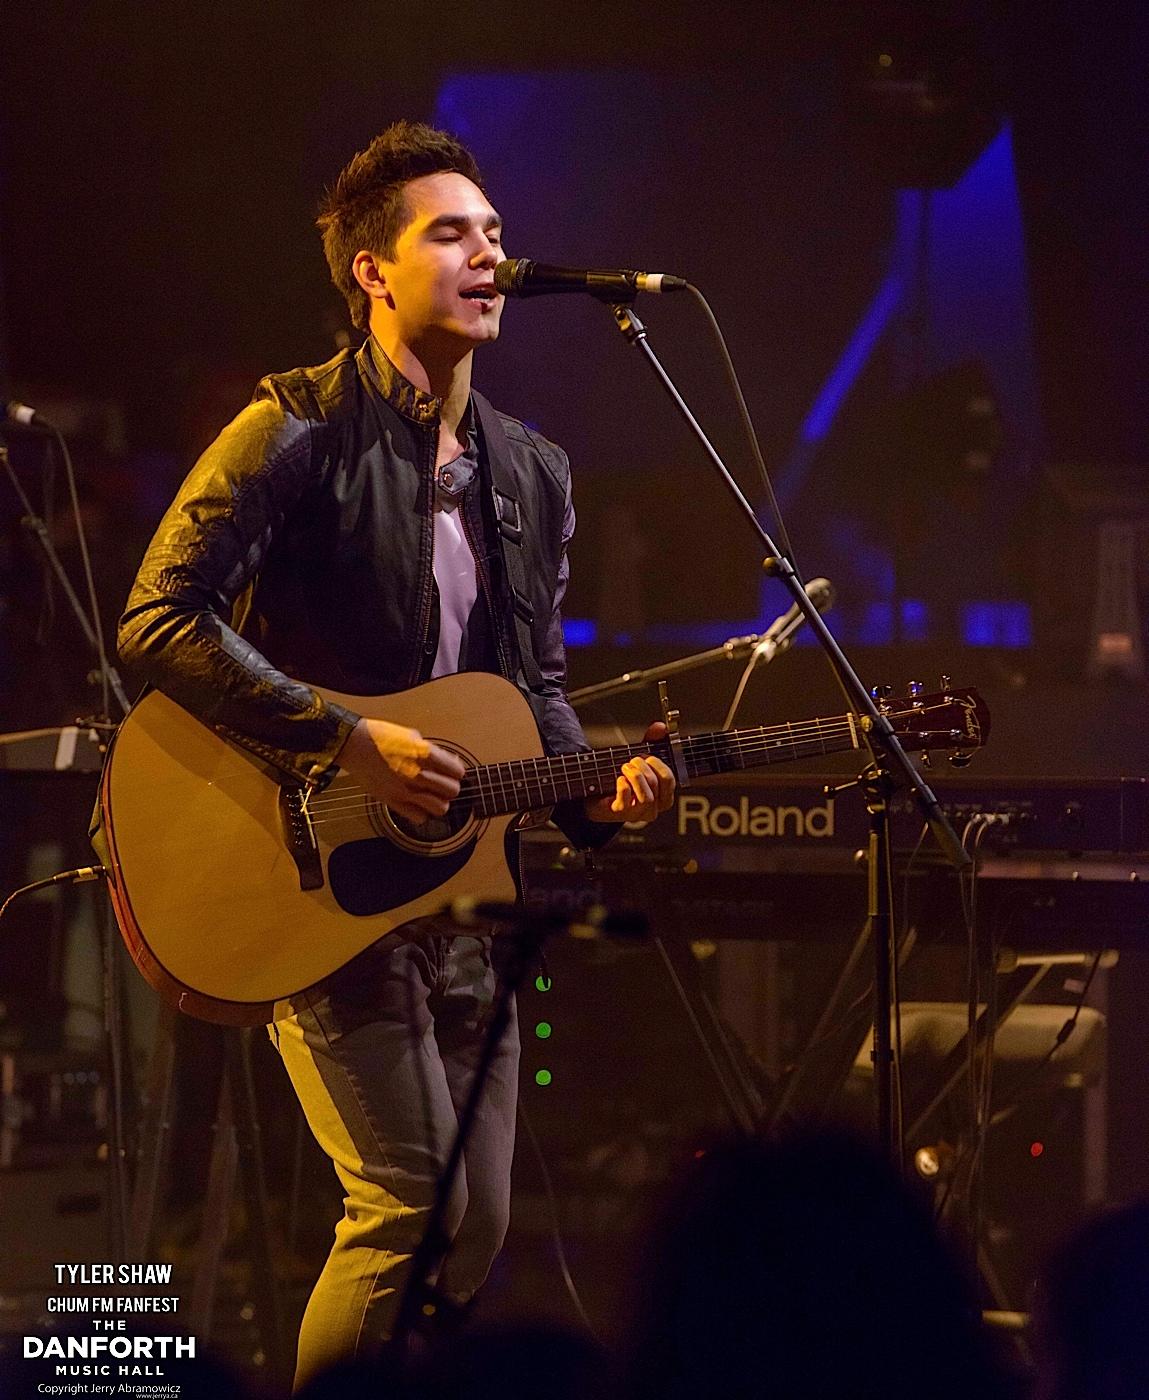 20130322 Tyler Shaw at The Danforth Music Hall Toronto 0165 copy